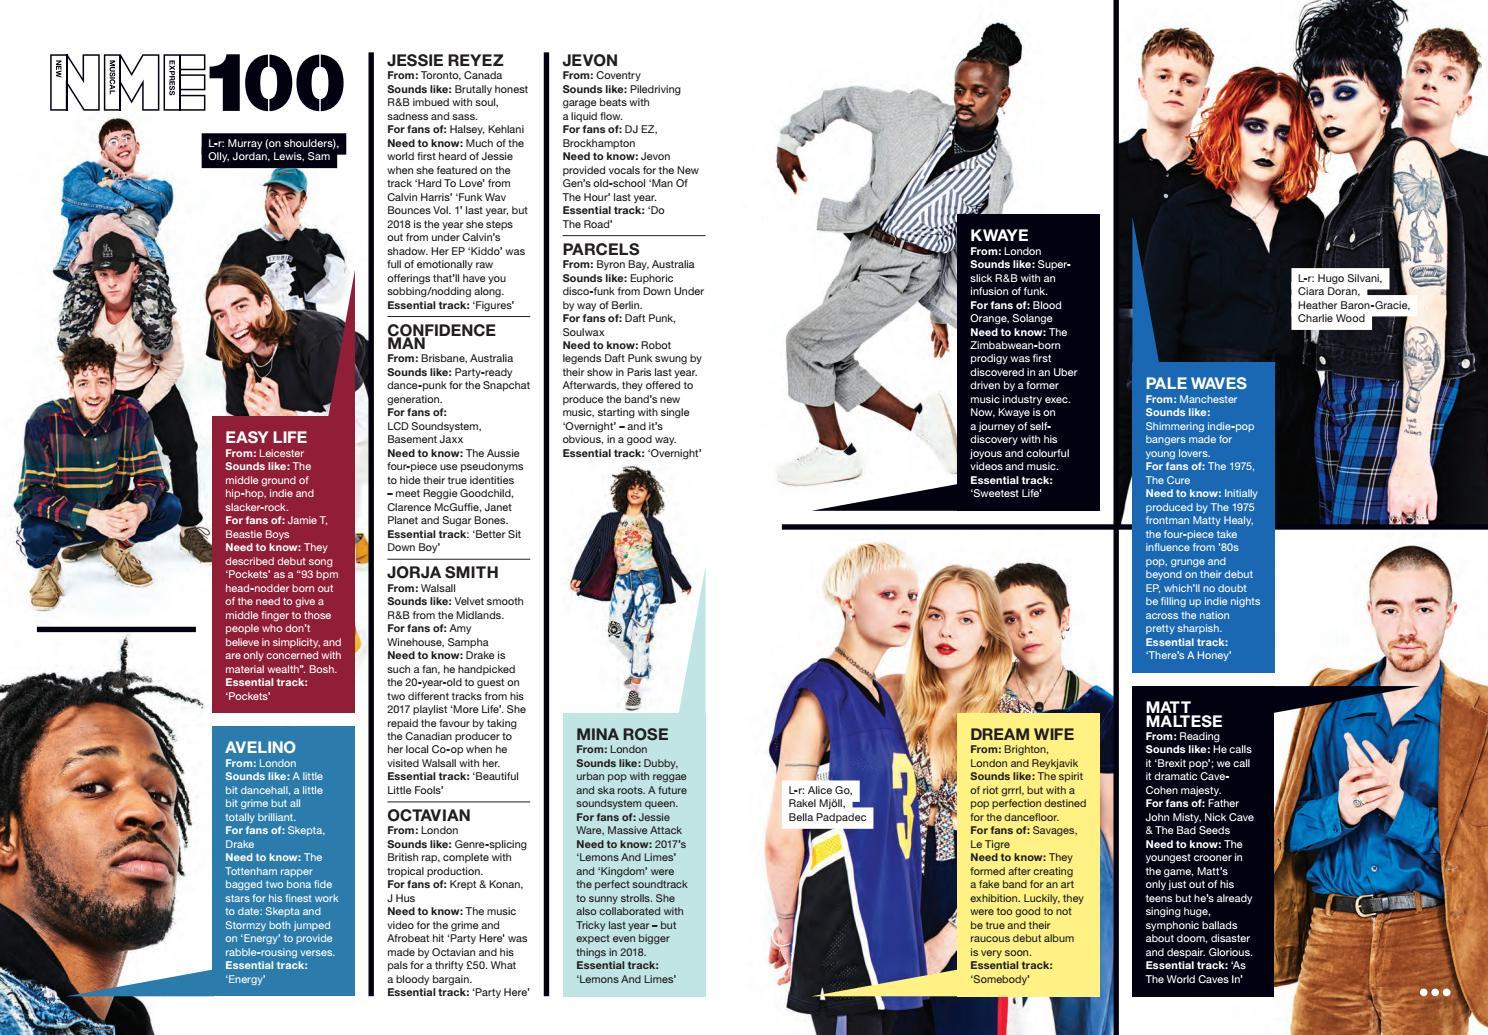 Nme 19 january